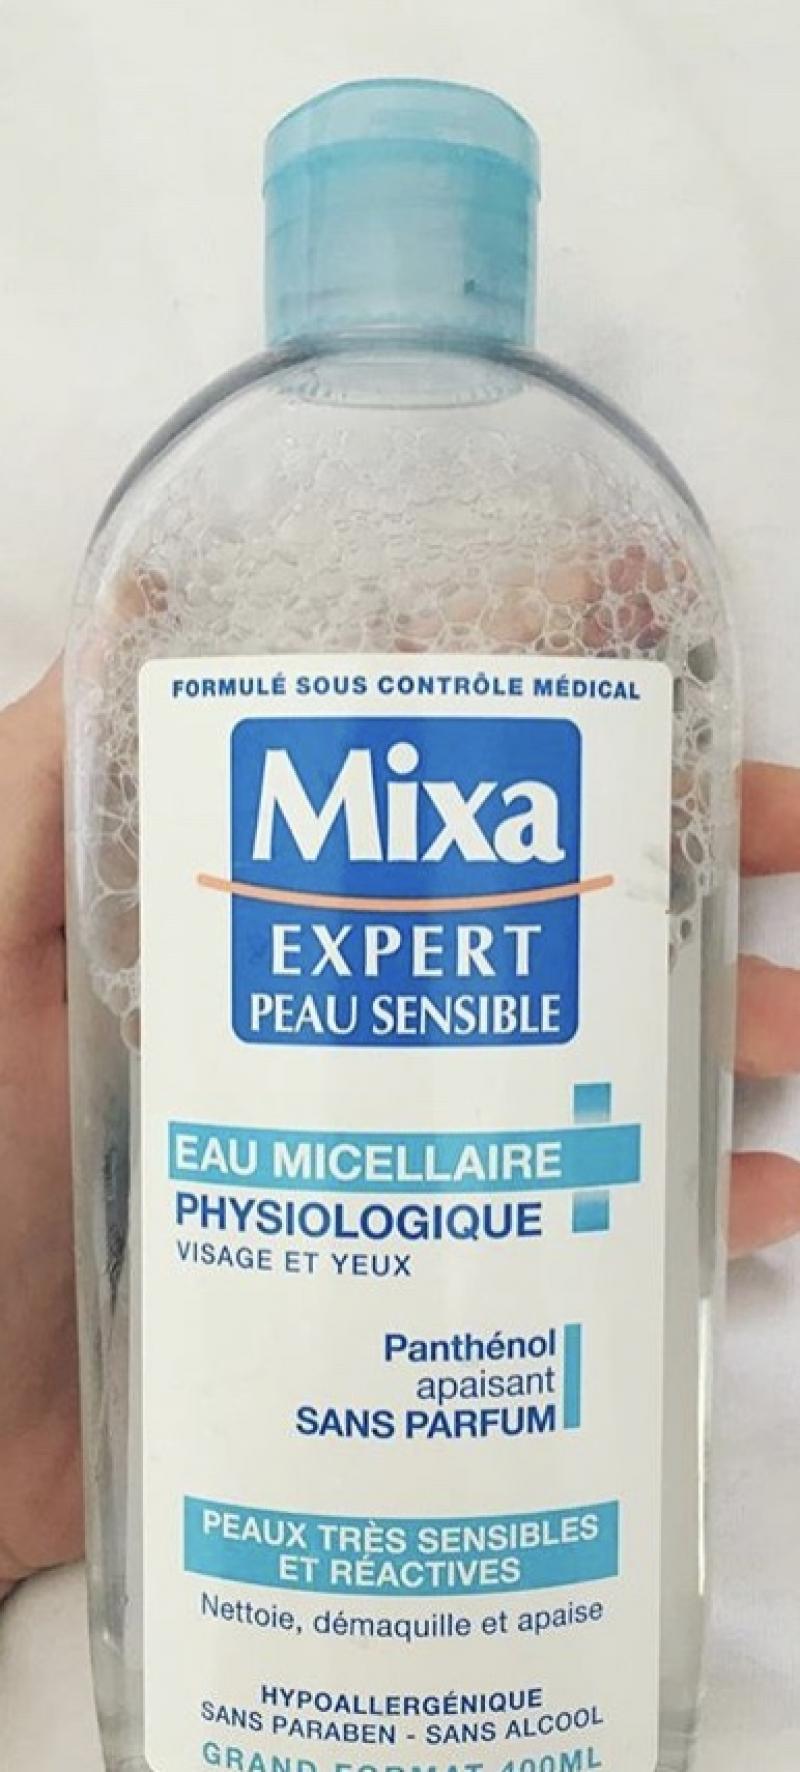 Swatch Eau Micellaire Physiologique, Mixa